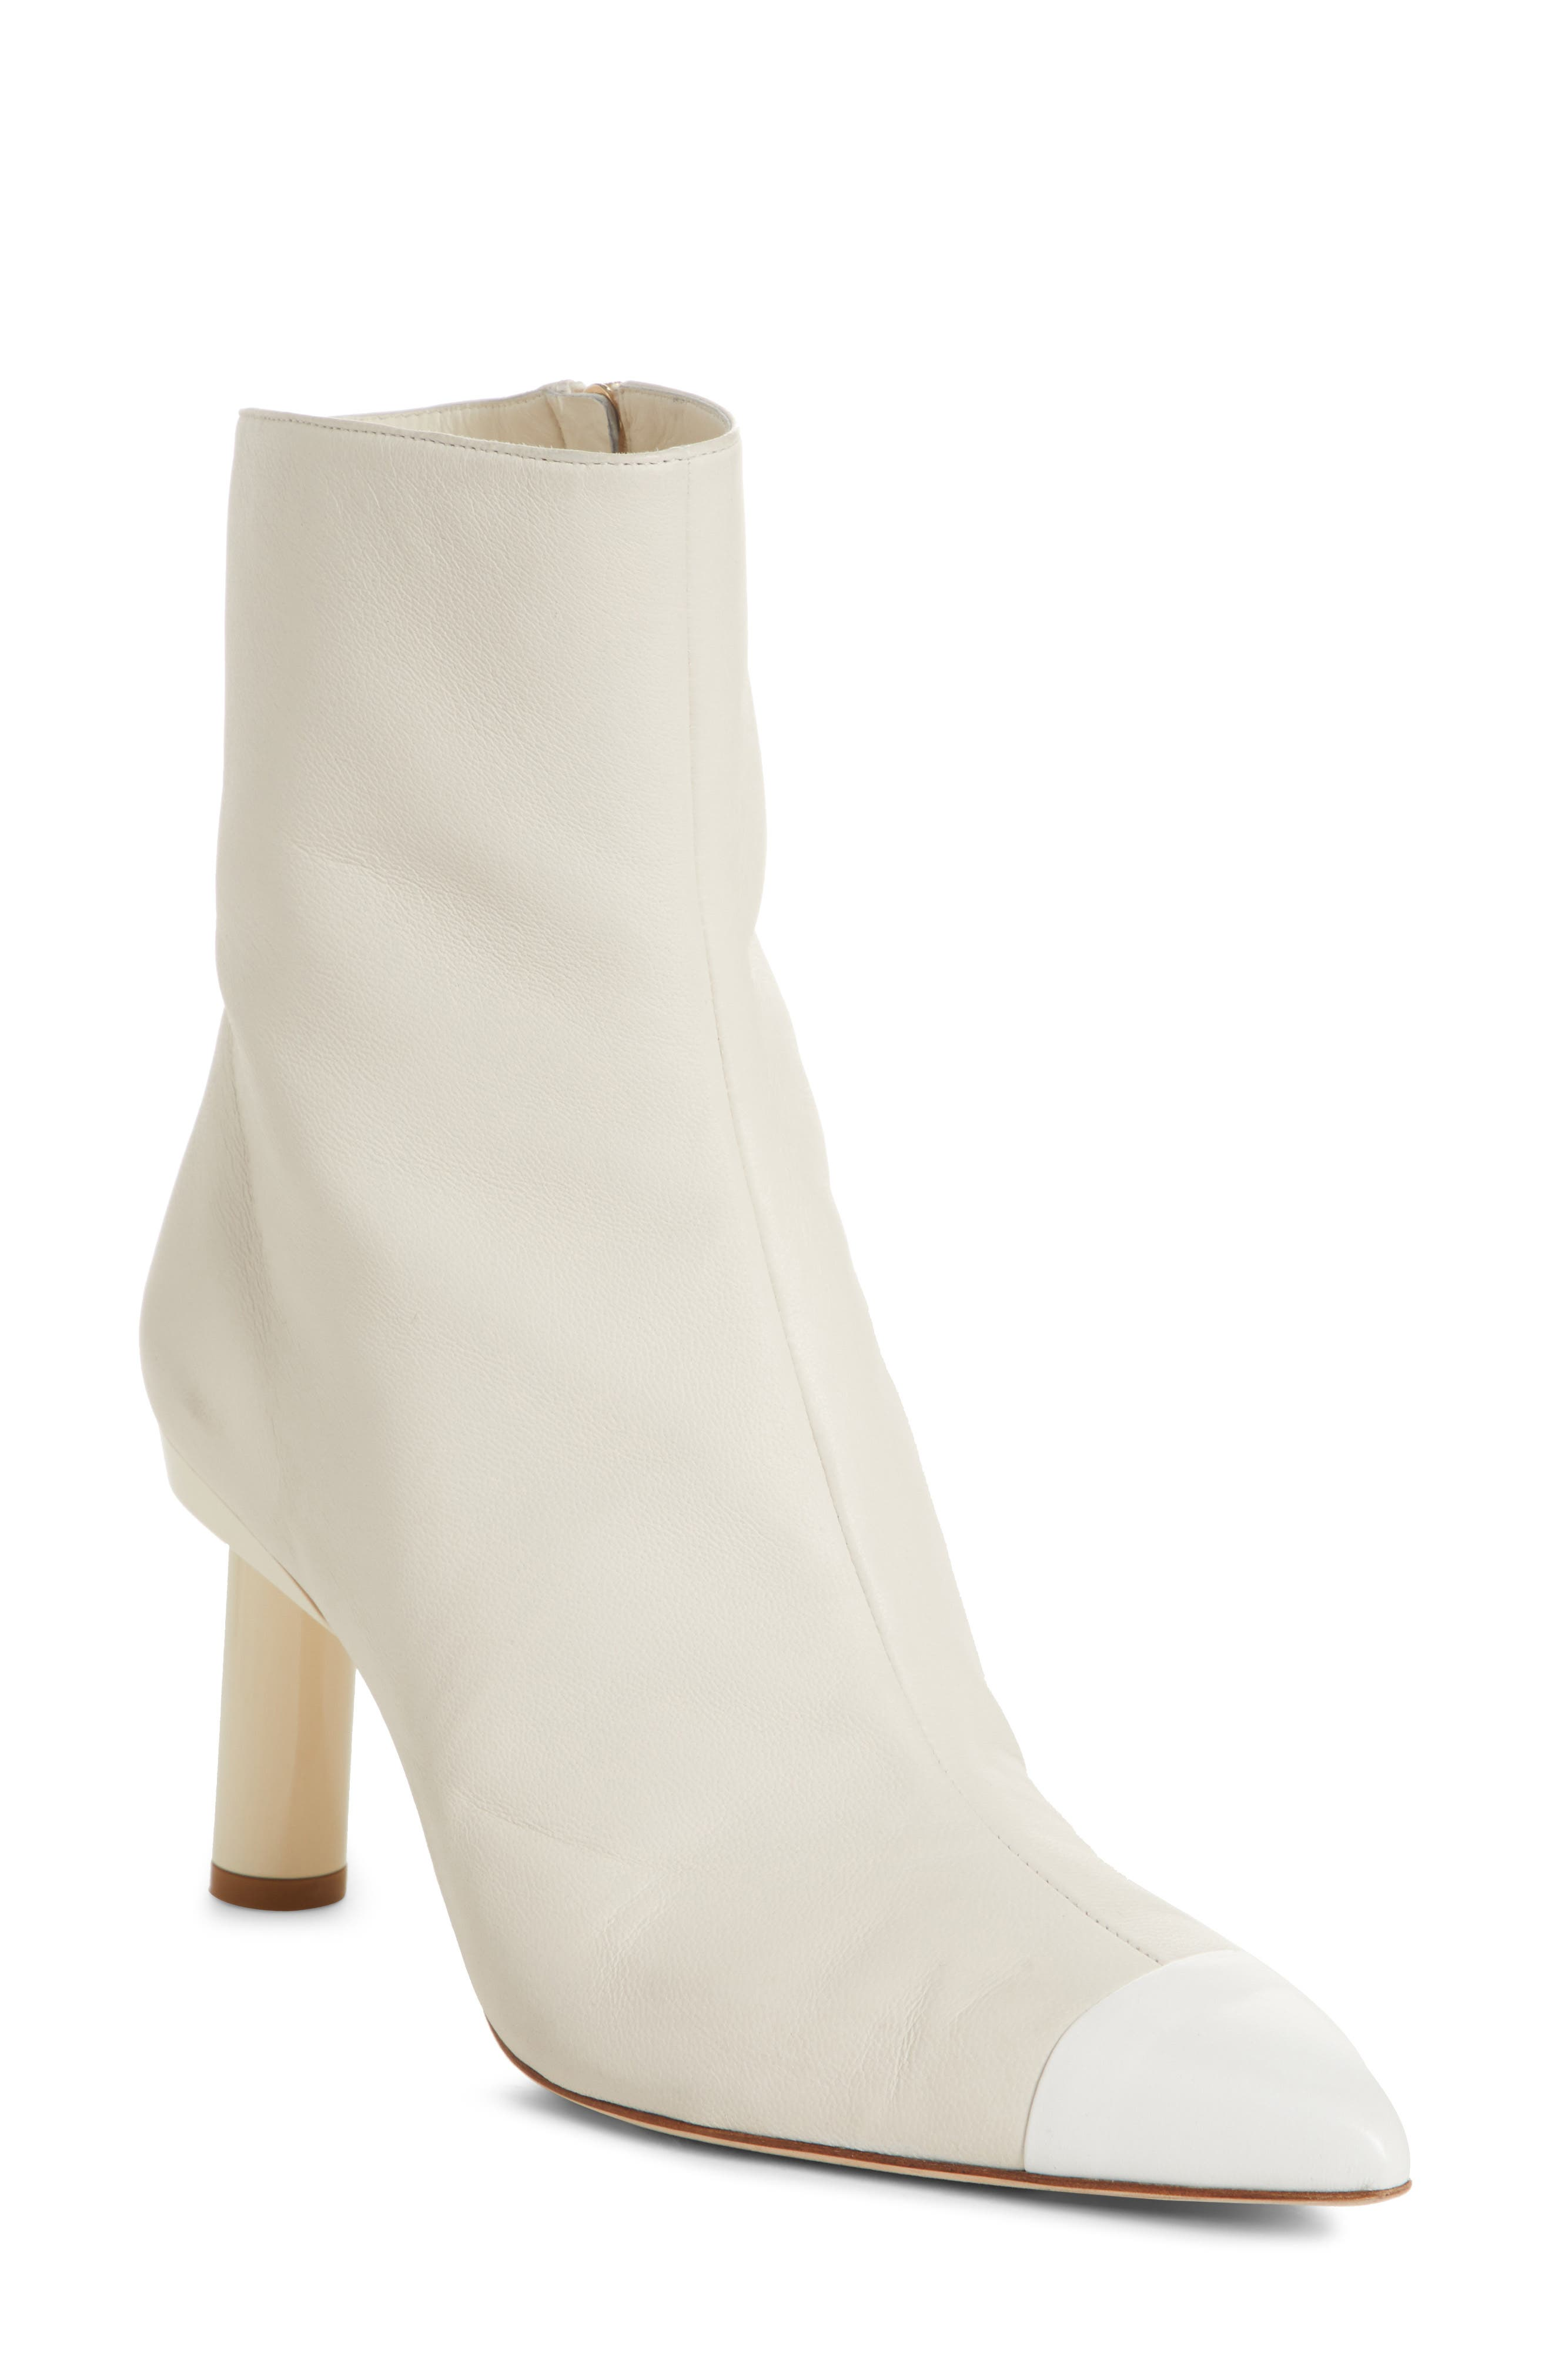 Grant Column Heel Bootie, Main, color, IVORY/ BRIGHT WHITE MULTI